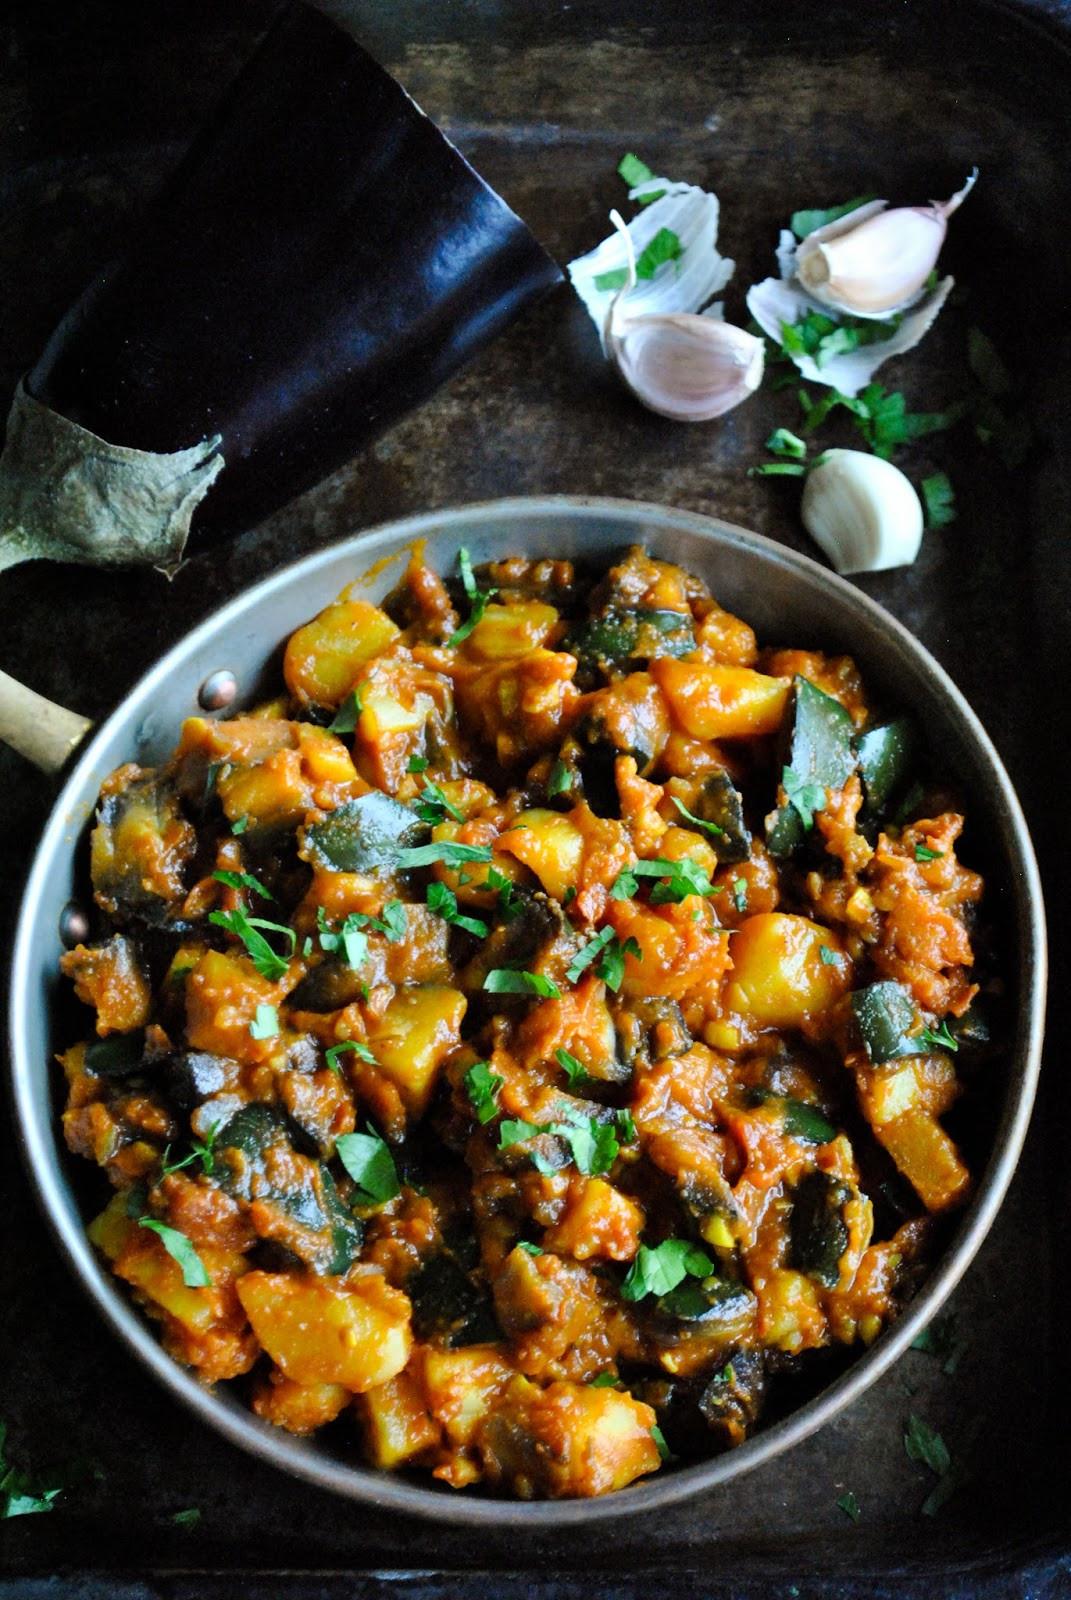 Best Healthy Vegan Recipes  15 delicious vegan recipes for beginners VeganSandra